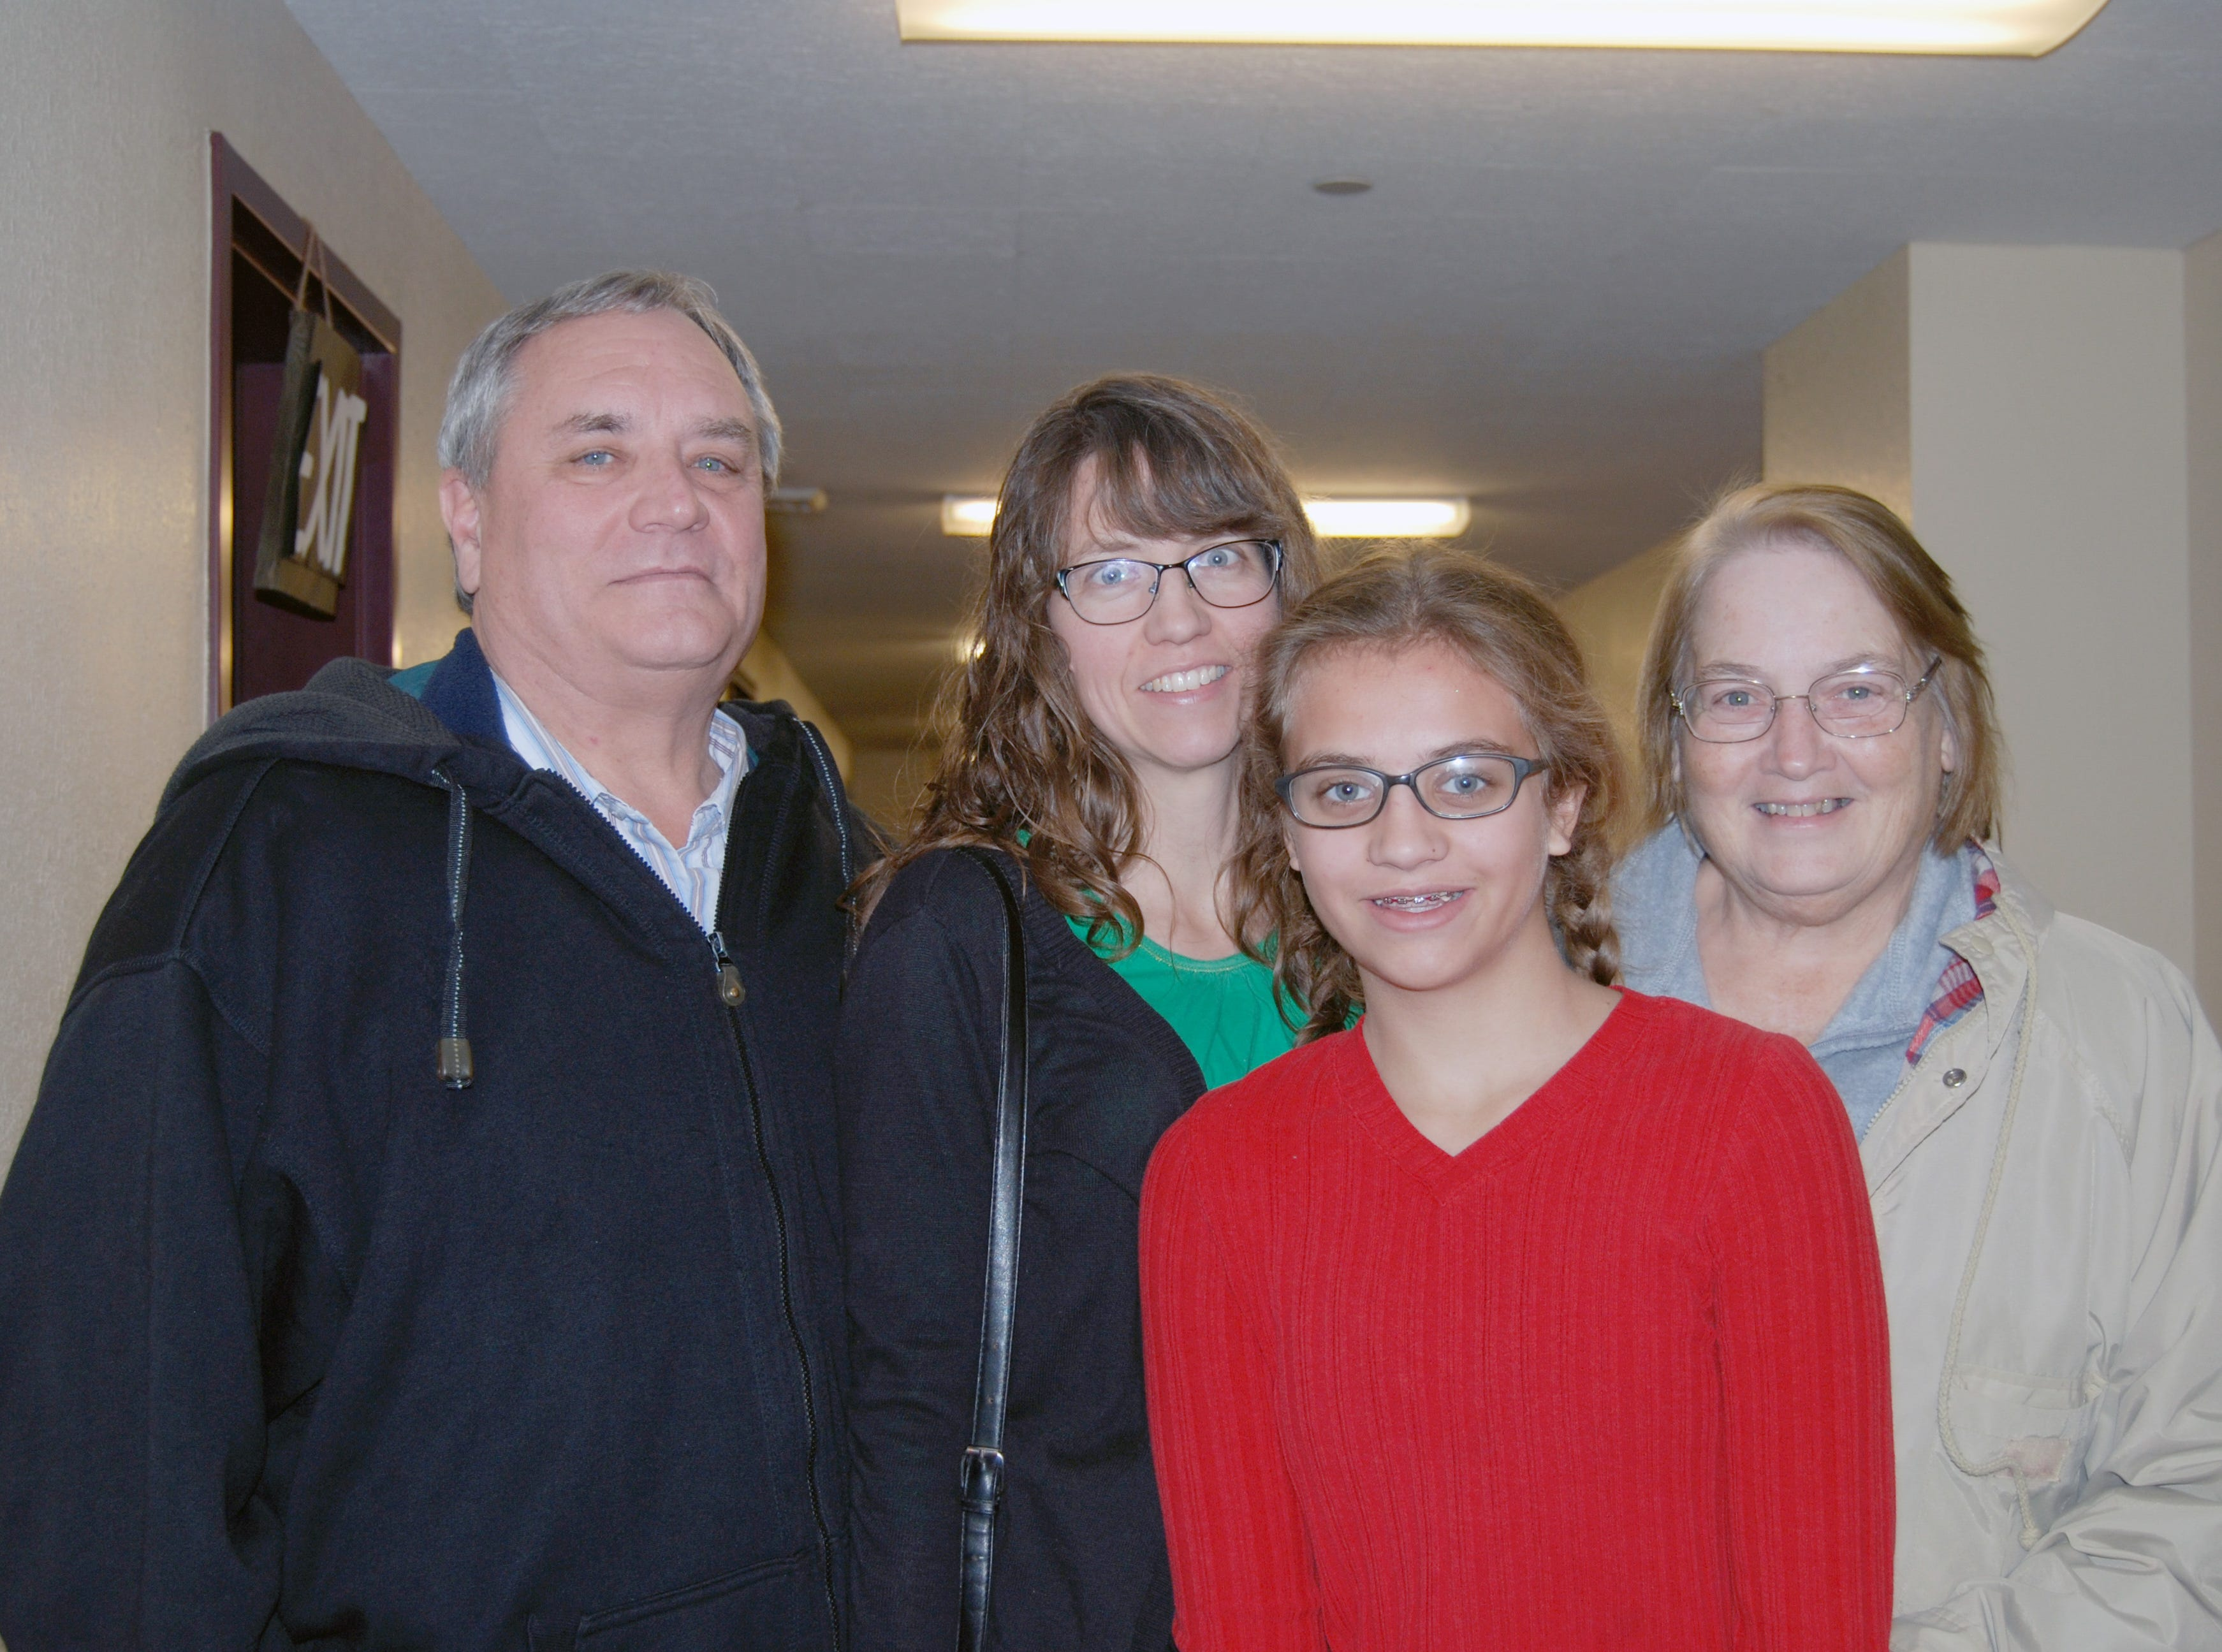 Devan, Jessica, Lea and Karen Maughan